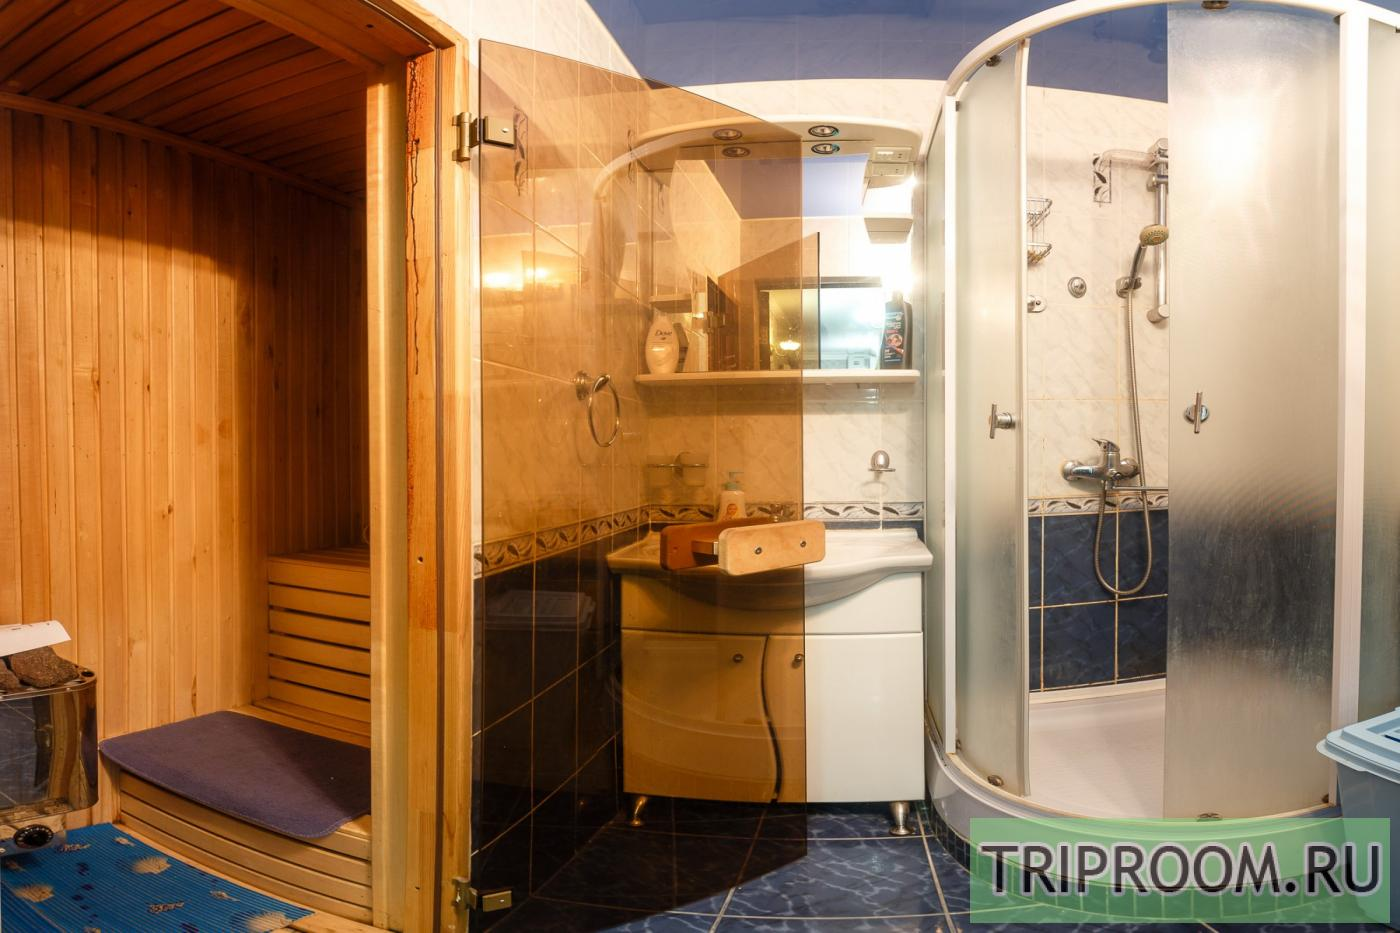 3-комнатная квартира посуточно (вариант № 15948), ул. Назарбаева улица, фото № 21